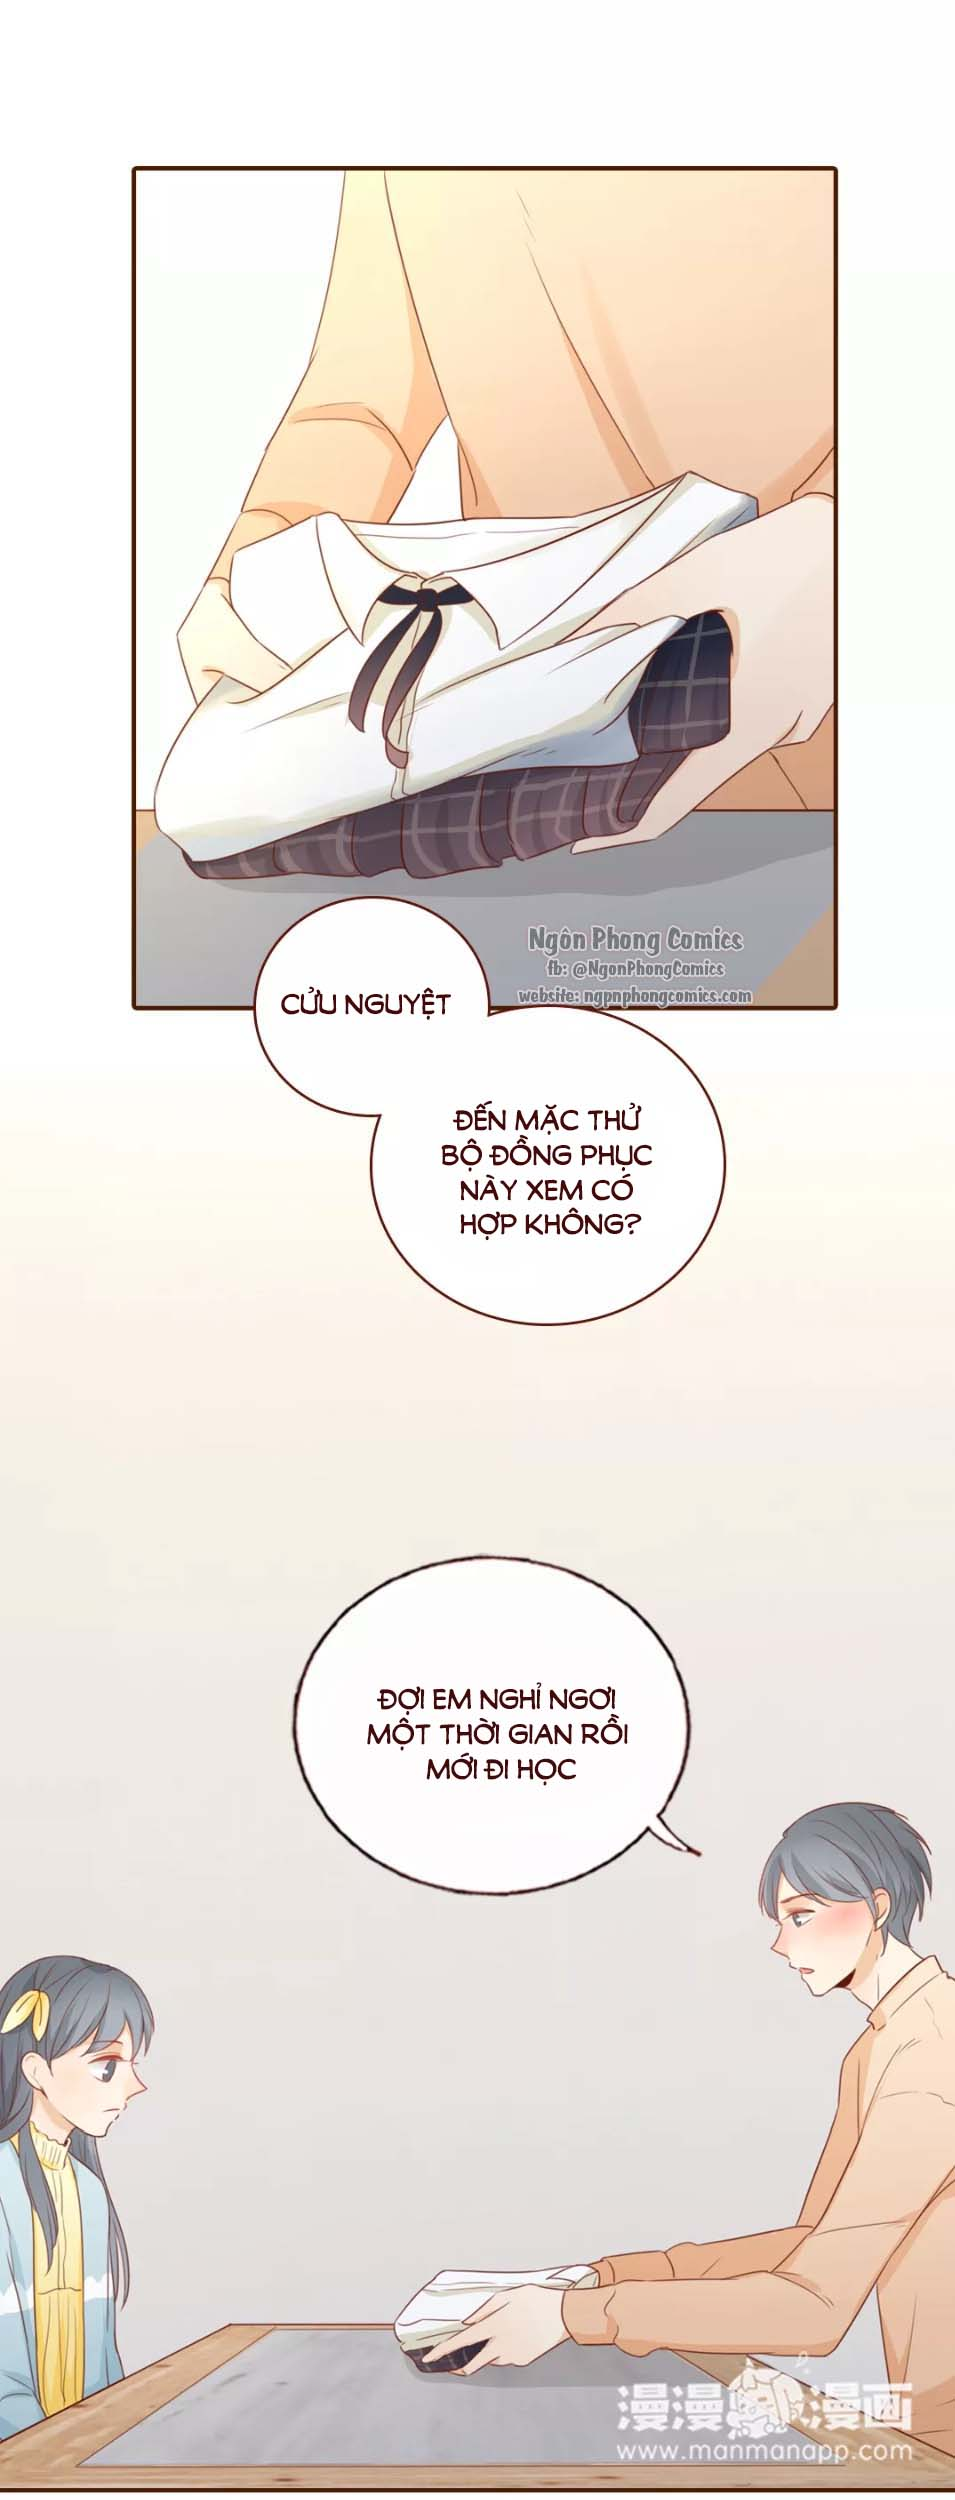 Trái Tim Bí Ẩn Chapter 68 - Truyenmoi.xyz